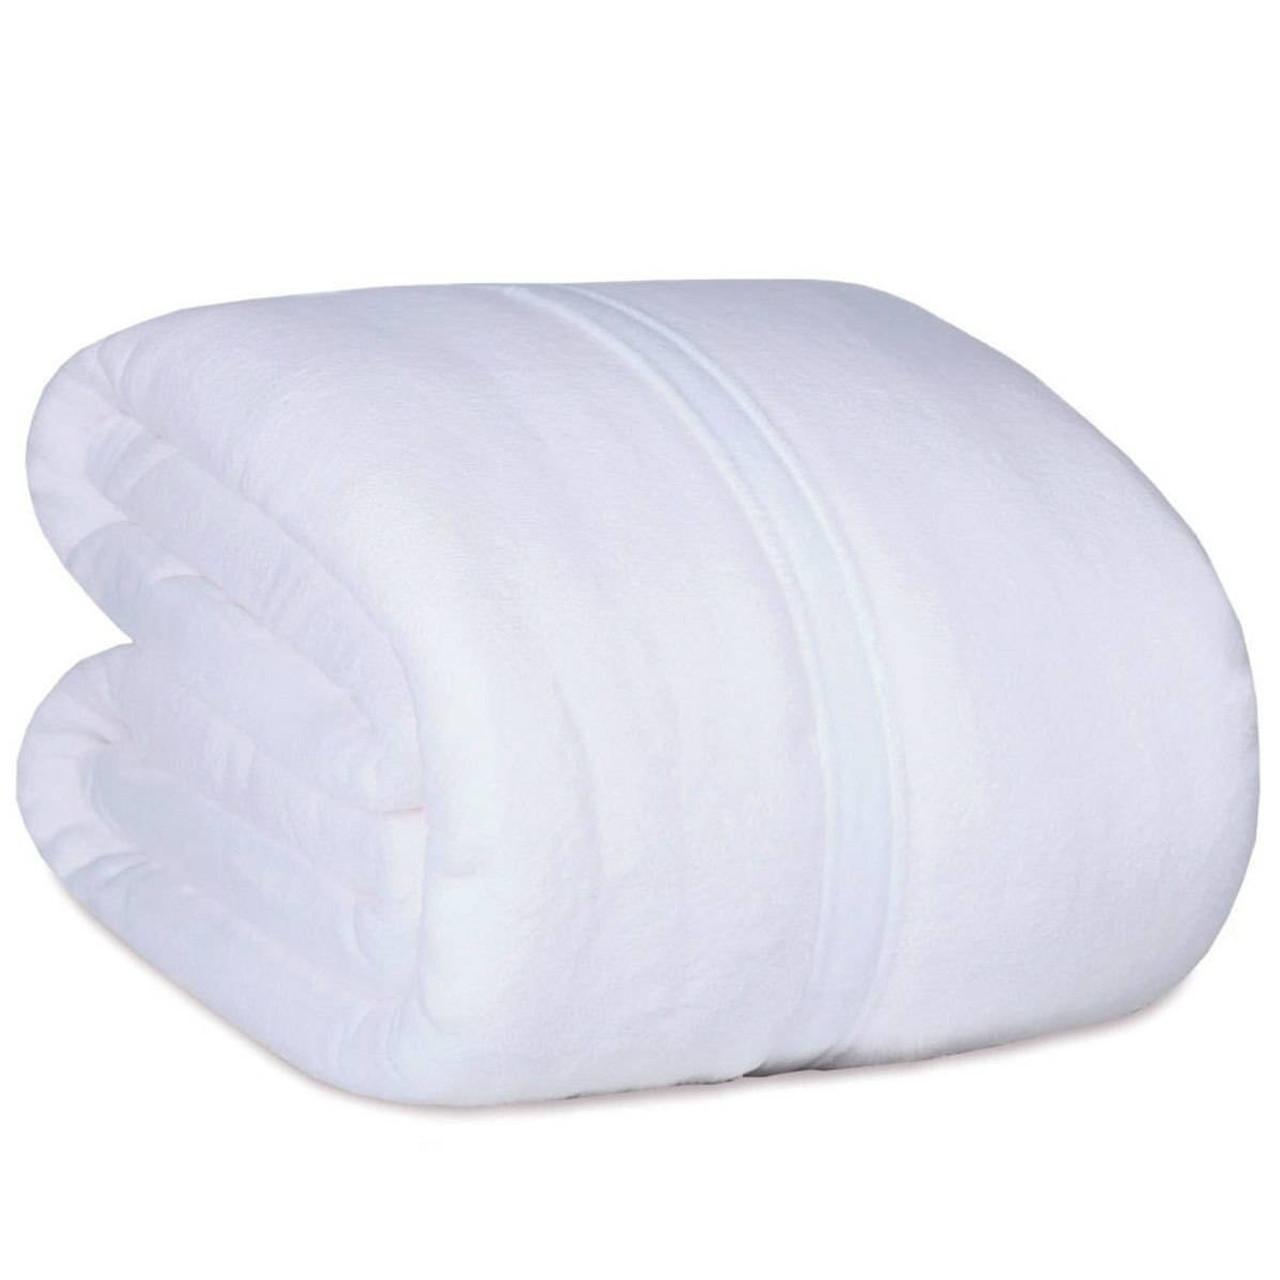 Berkshire Blankets BERKSHIRE or SERAOFT BLANKETS